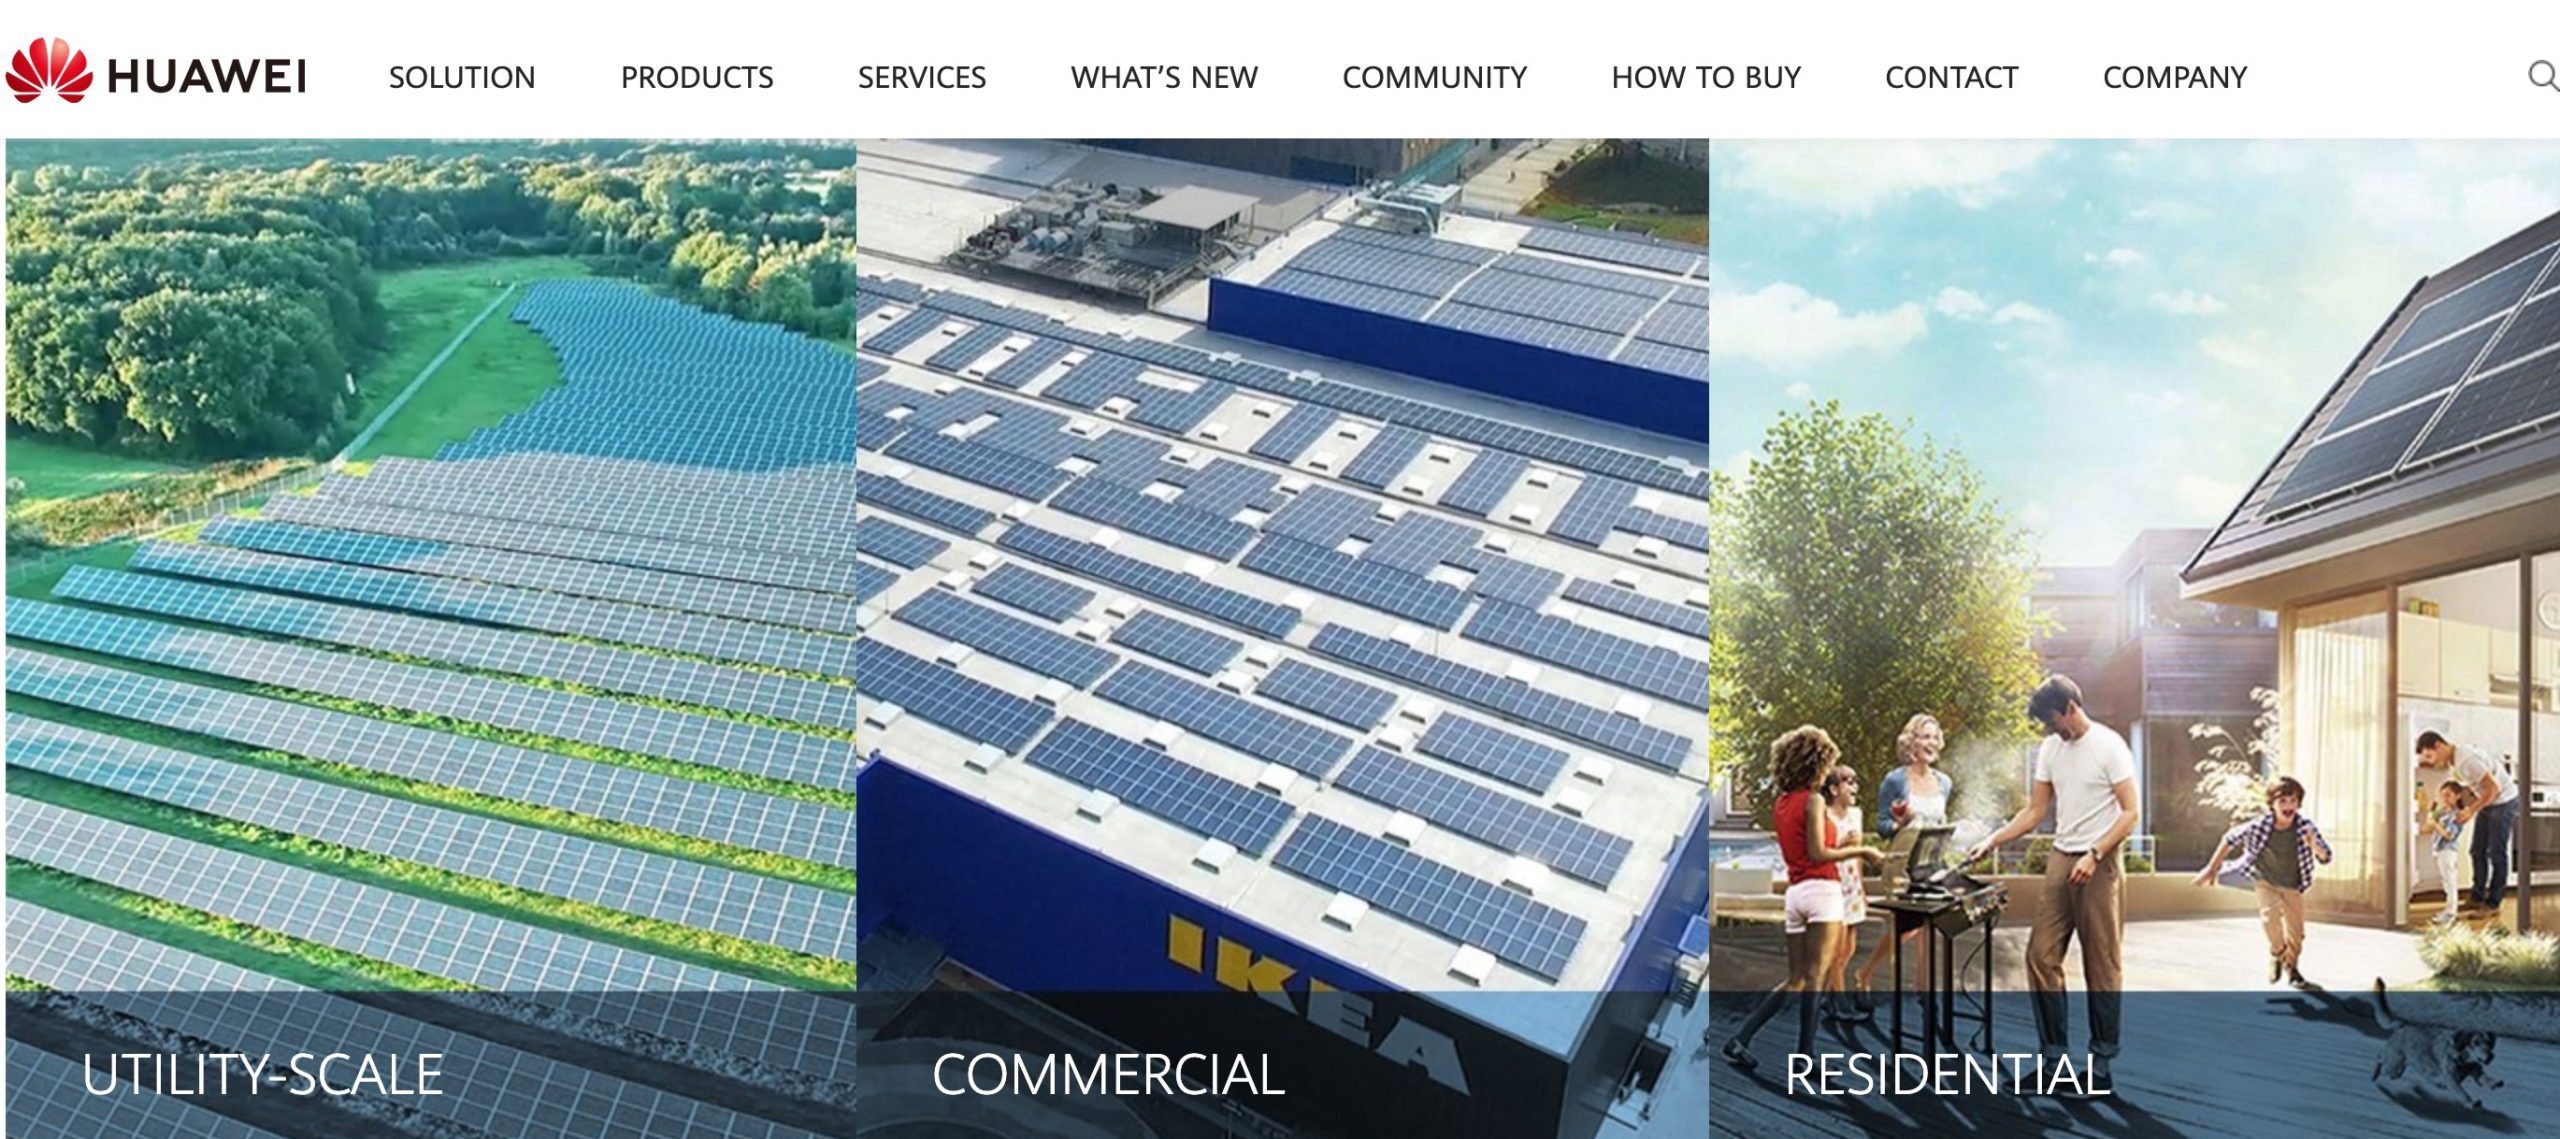 Huawei Solar system types